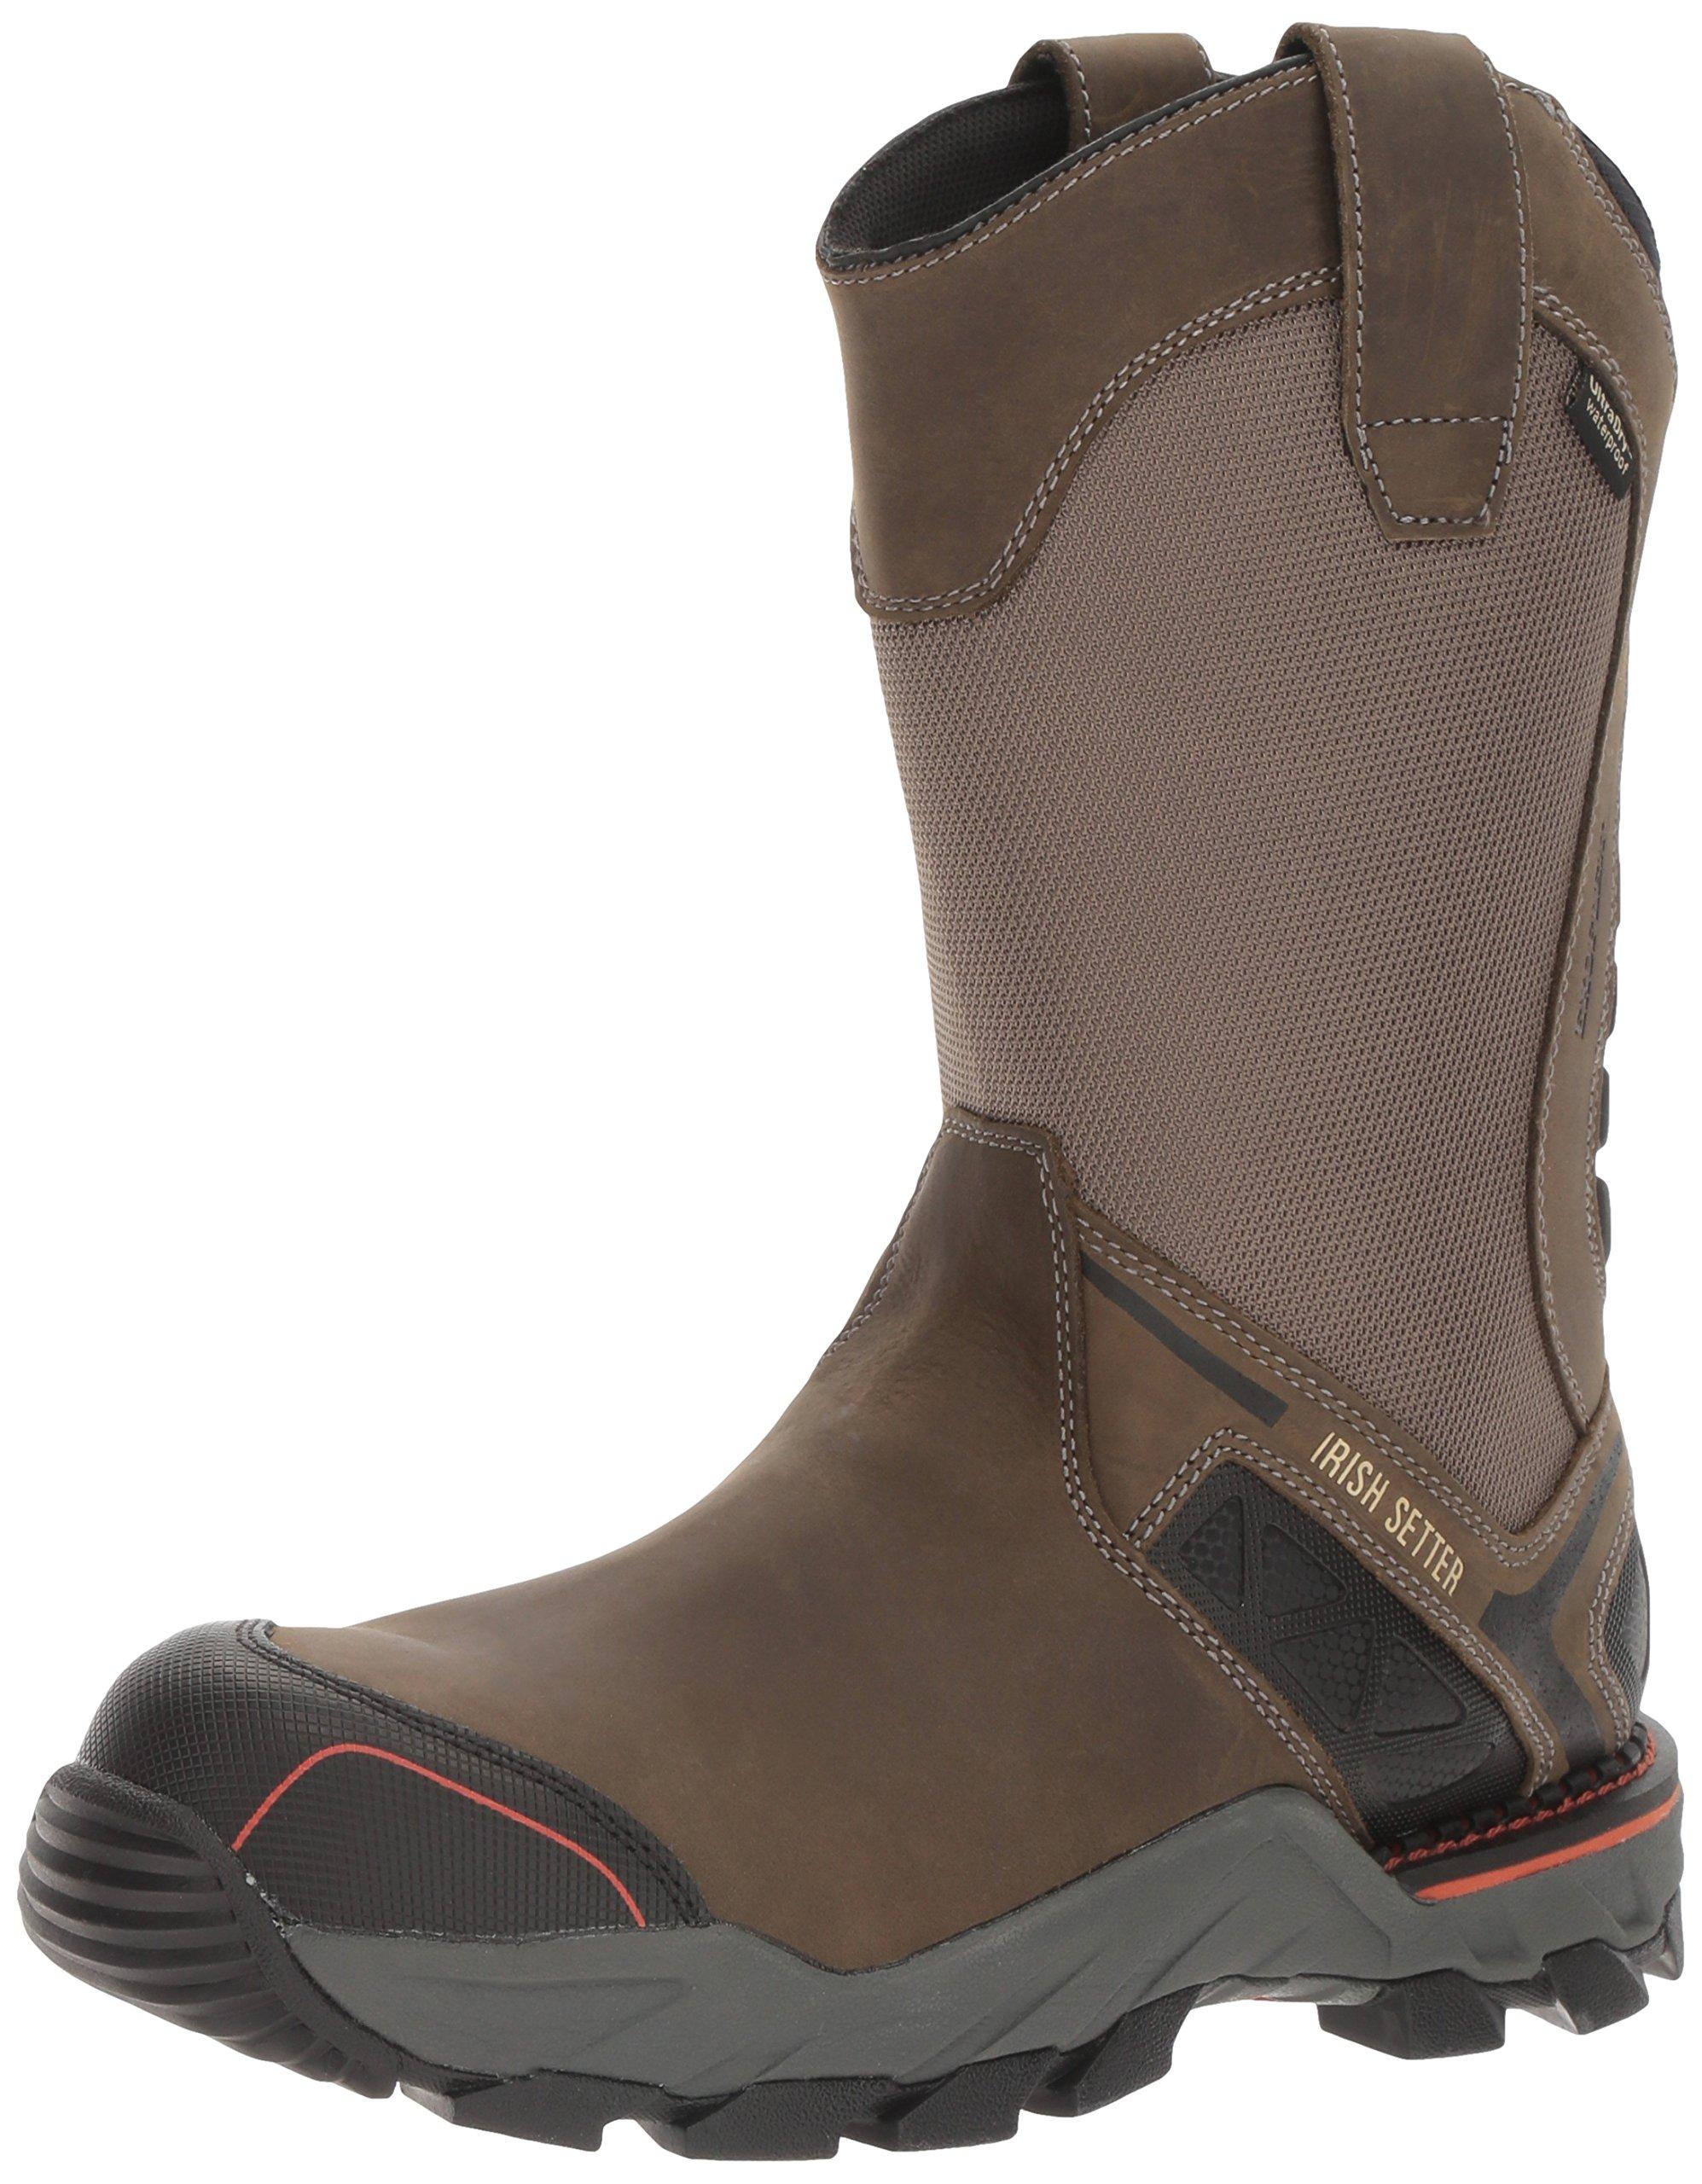 Irish Setter Work Men's Crosby Nano Toe Waterproof Pull-on Boot, Gray, 11.5 D US